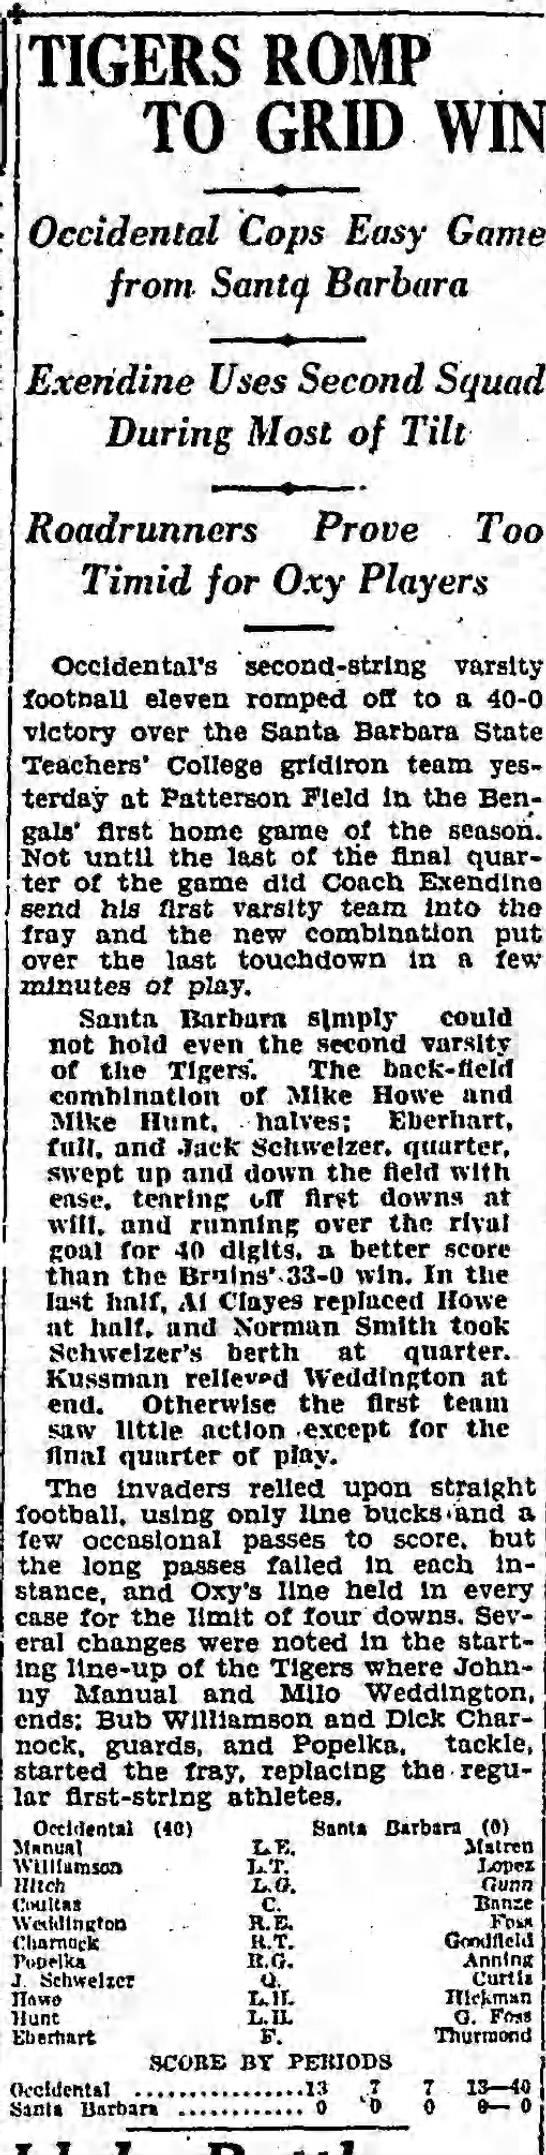 Tigers Romp to Grid Win -